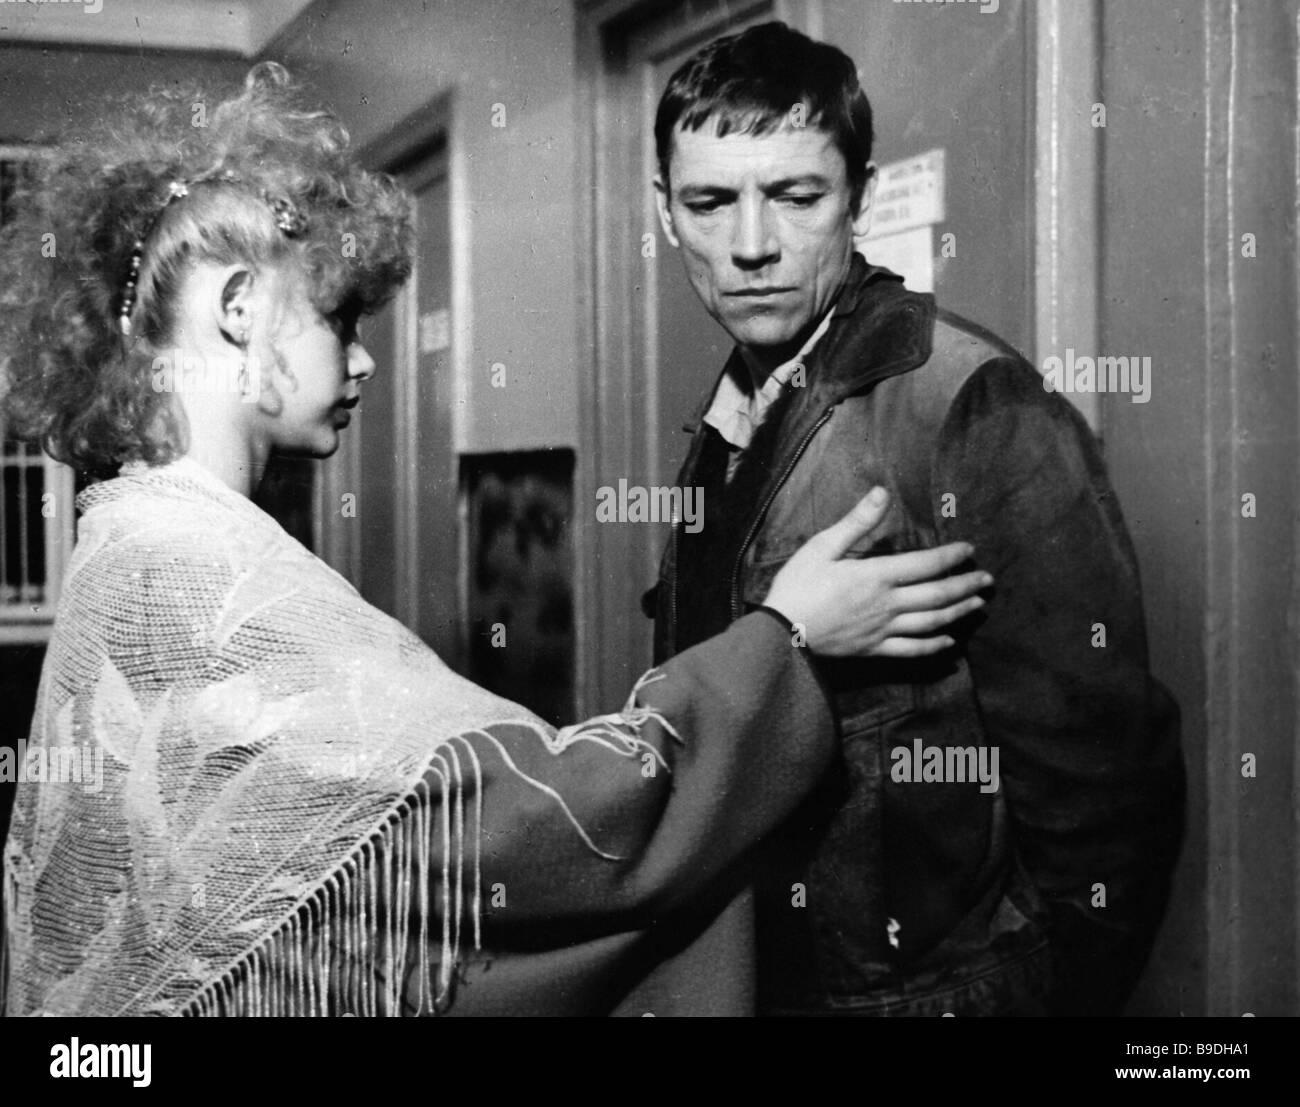 Olga Mashnaya as Olga left and Valery Priyomykhov as Vadim right in film Darling Beloved the Only One - Stock Image